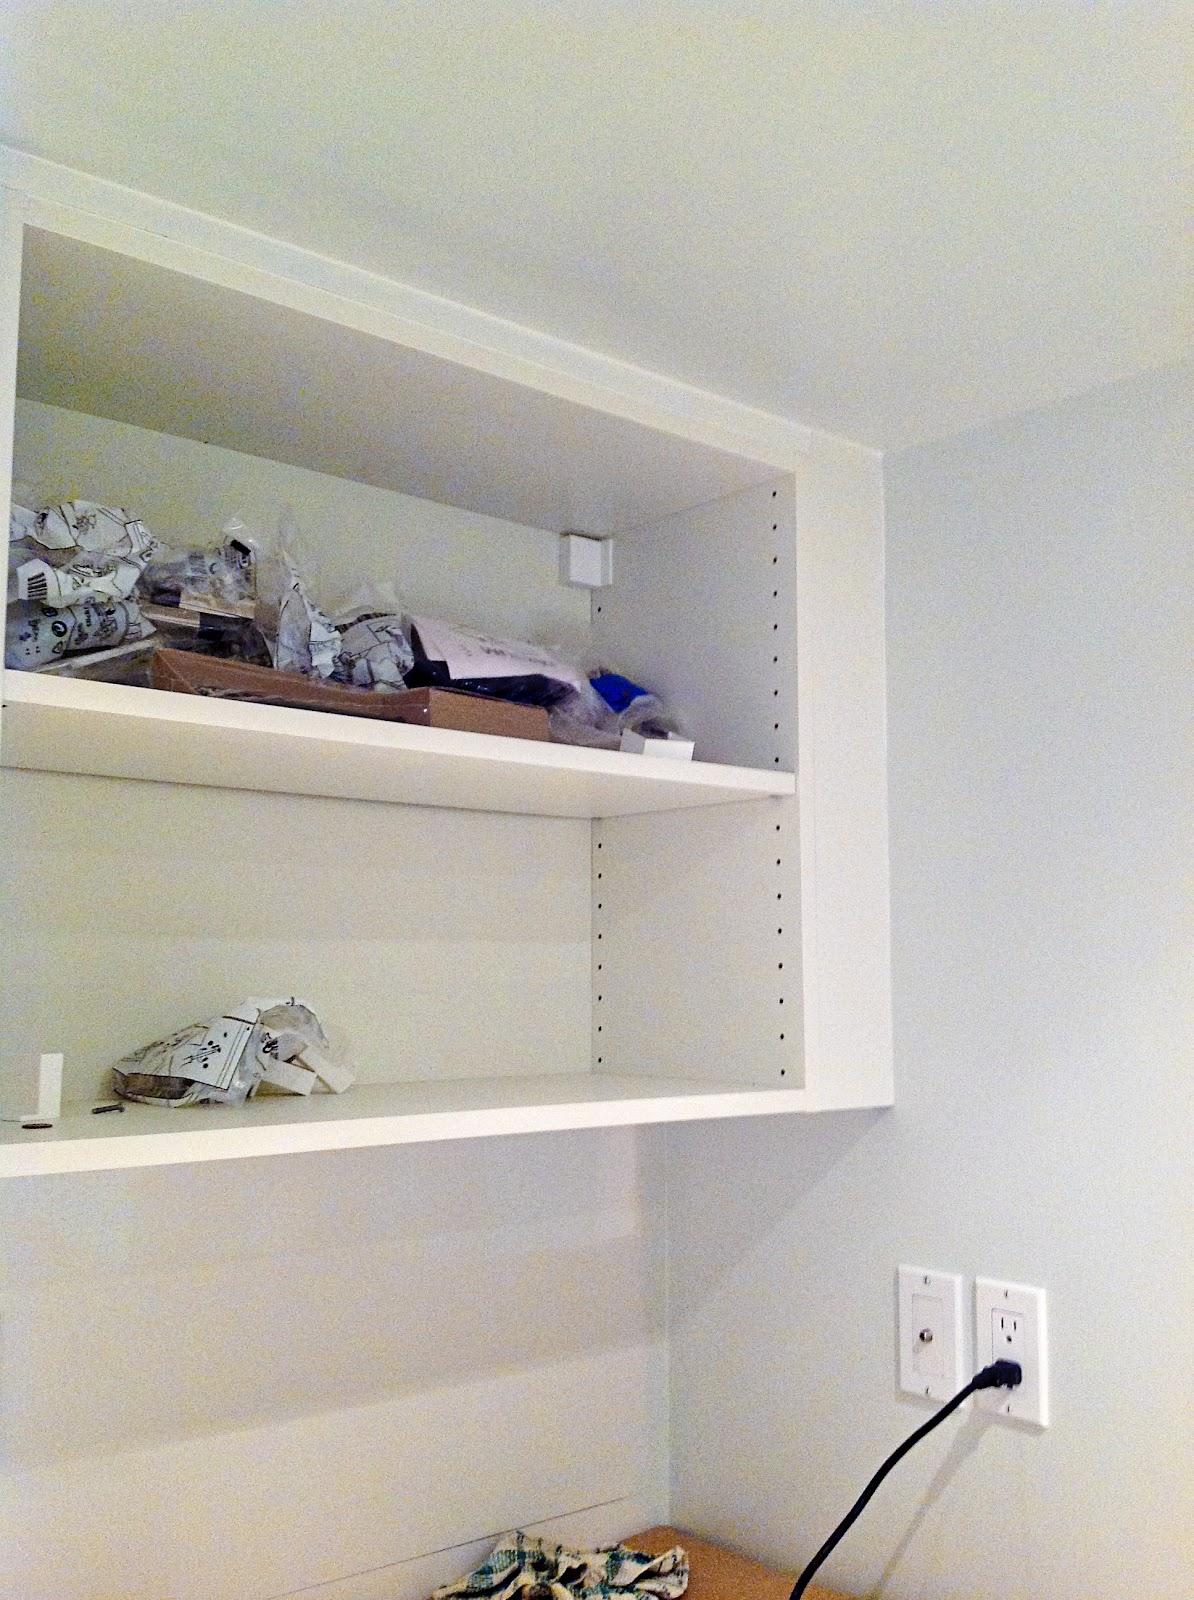 How To Make Cabinets Look Built In - Rambling Renovators